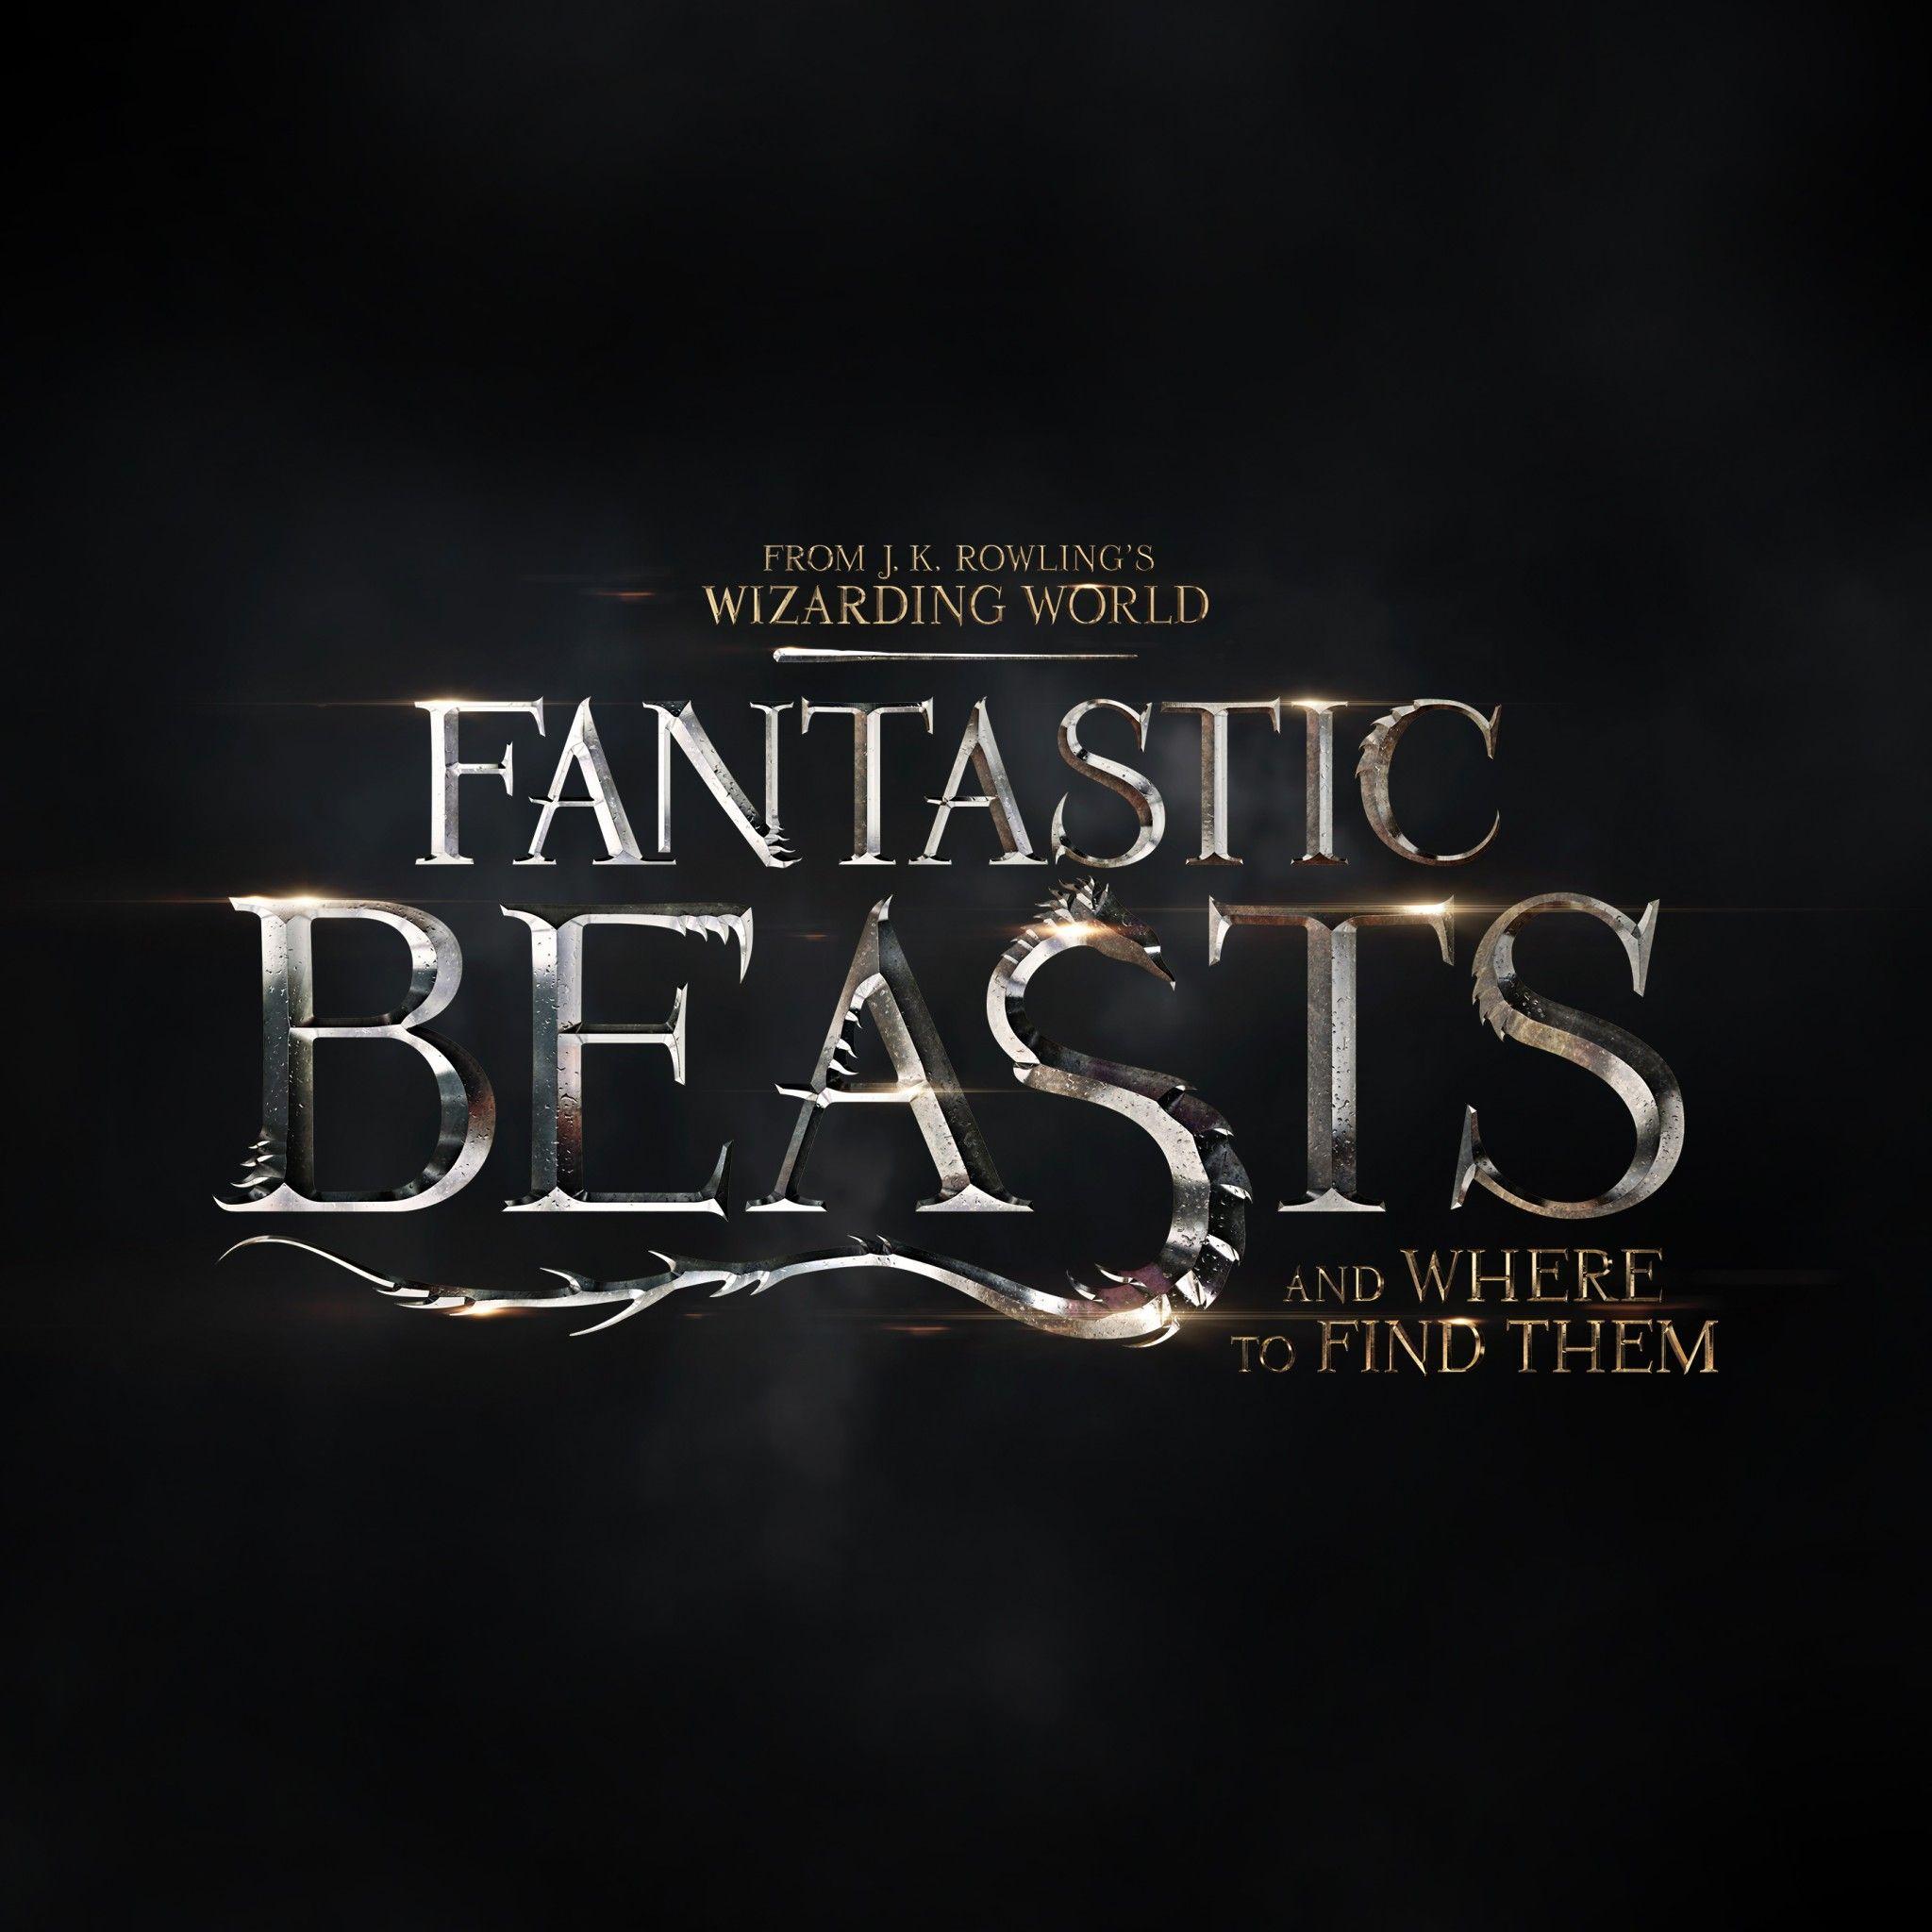 Most Inspiring Wallpaper Harry Potter Twitter - 5275f133f9029a15ea32505ca42b8ce9  HD_668062.jpg